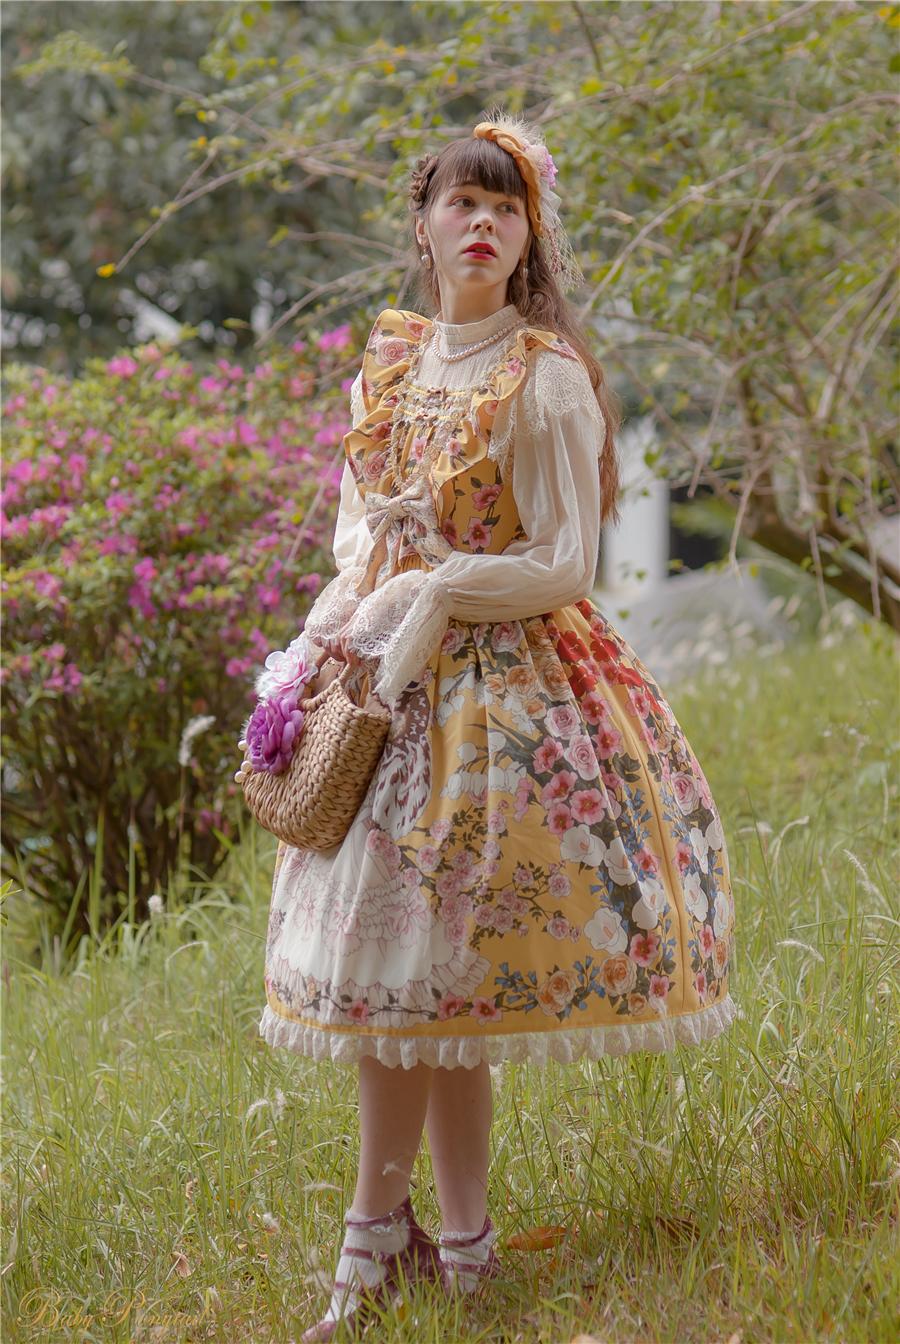 Baby Ponytail_Model Photo_Polly's Garden of Dreams_JSK Yellow_Claudia_4.jpg